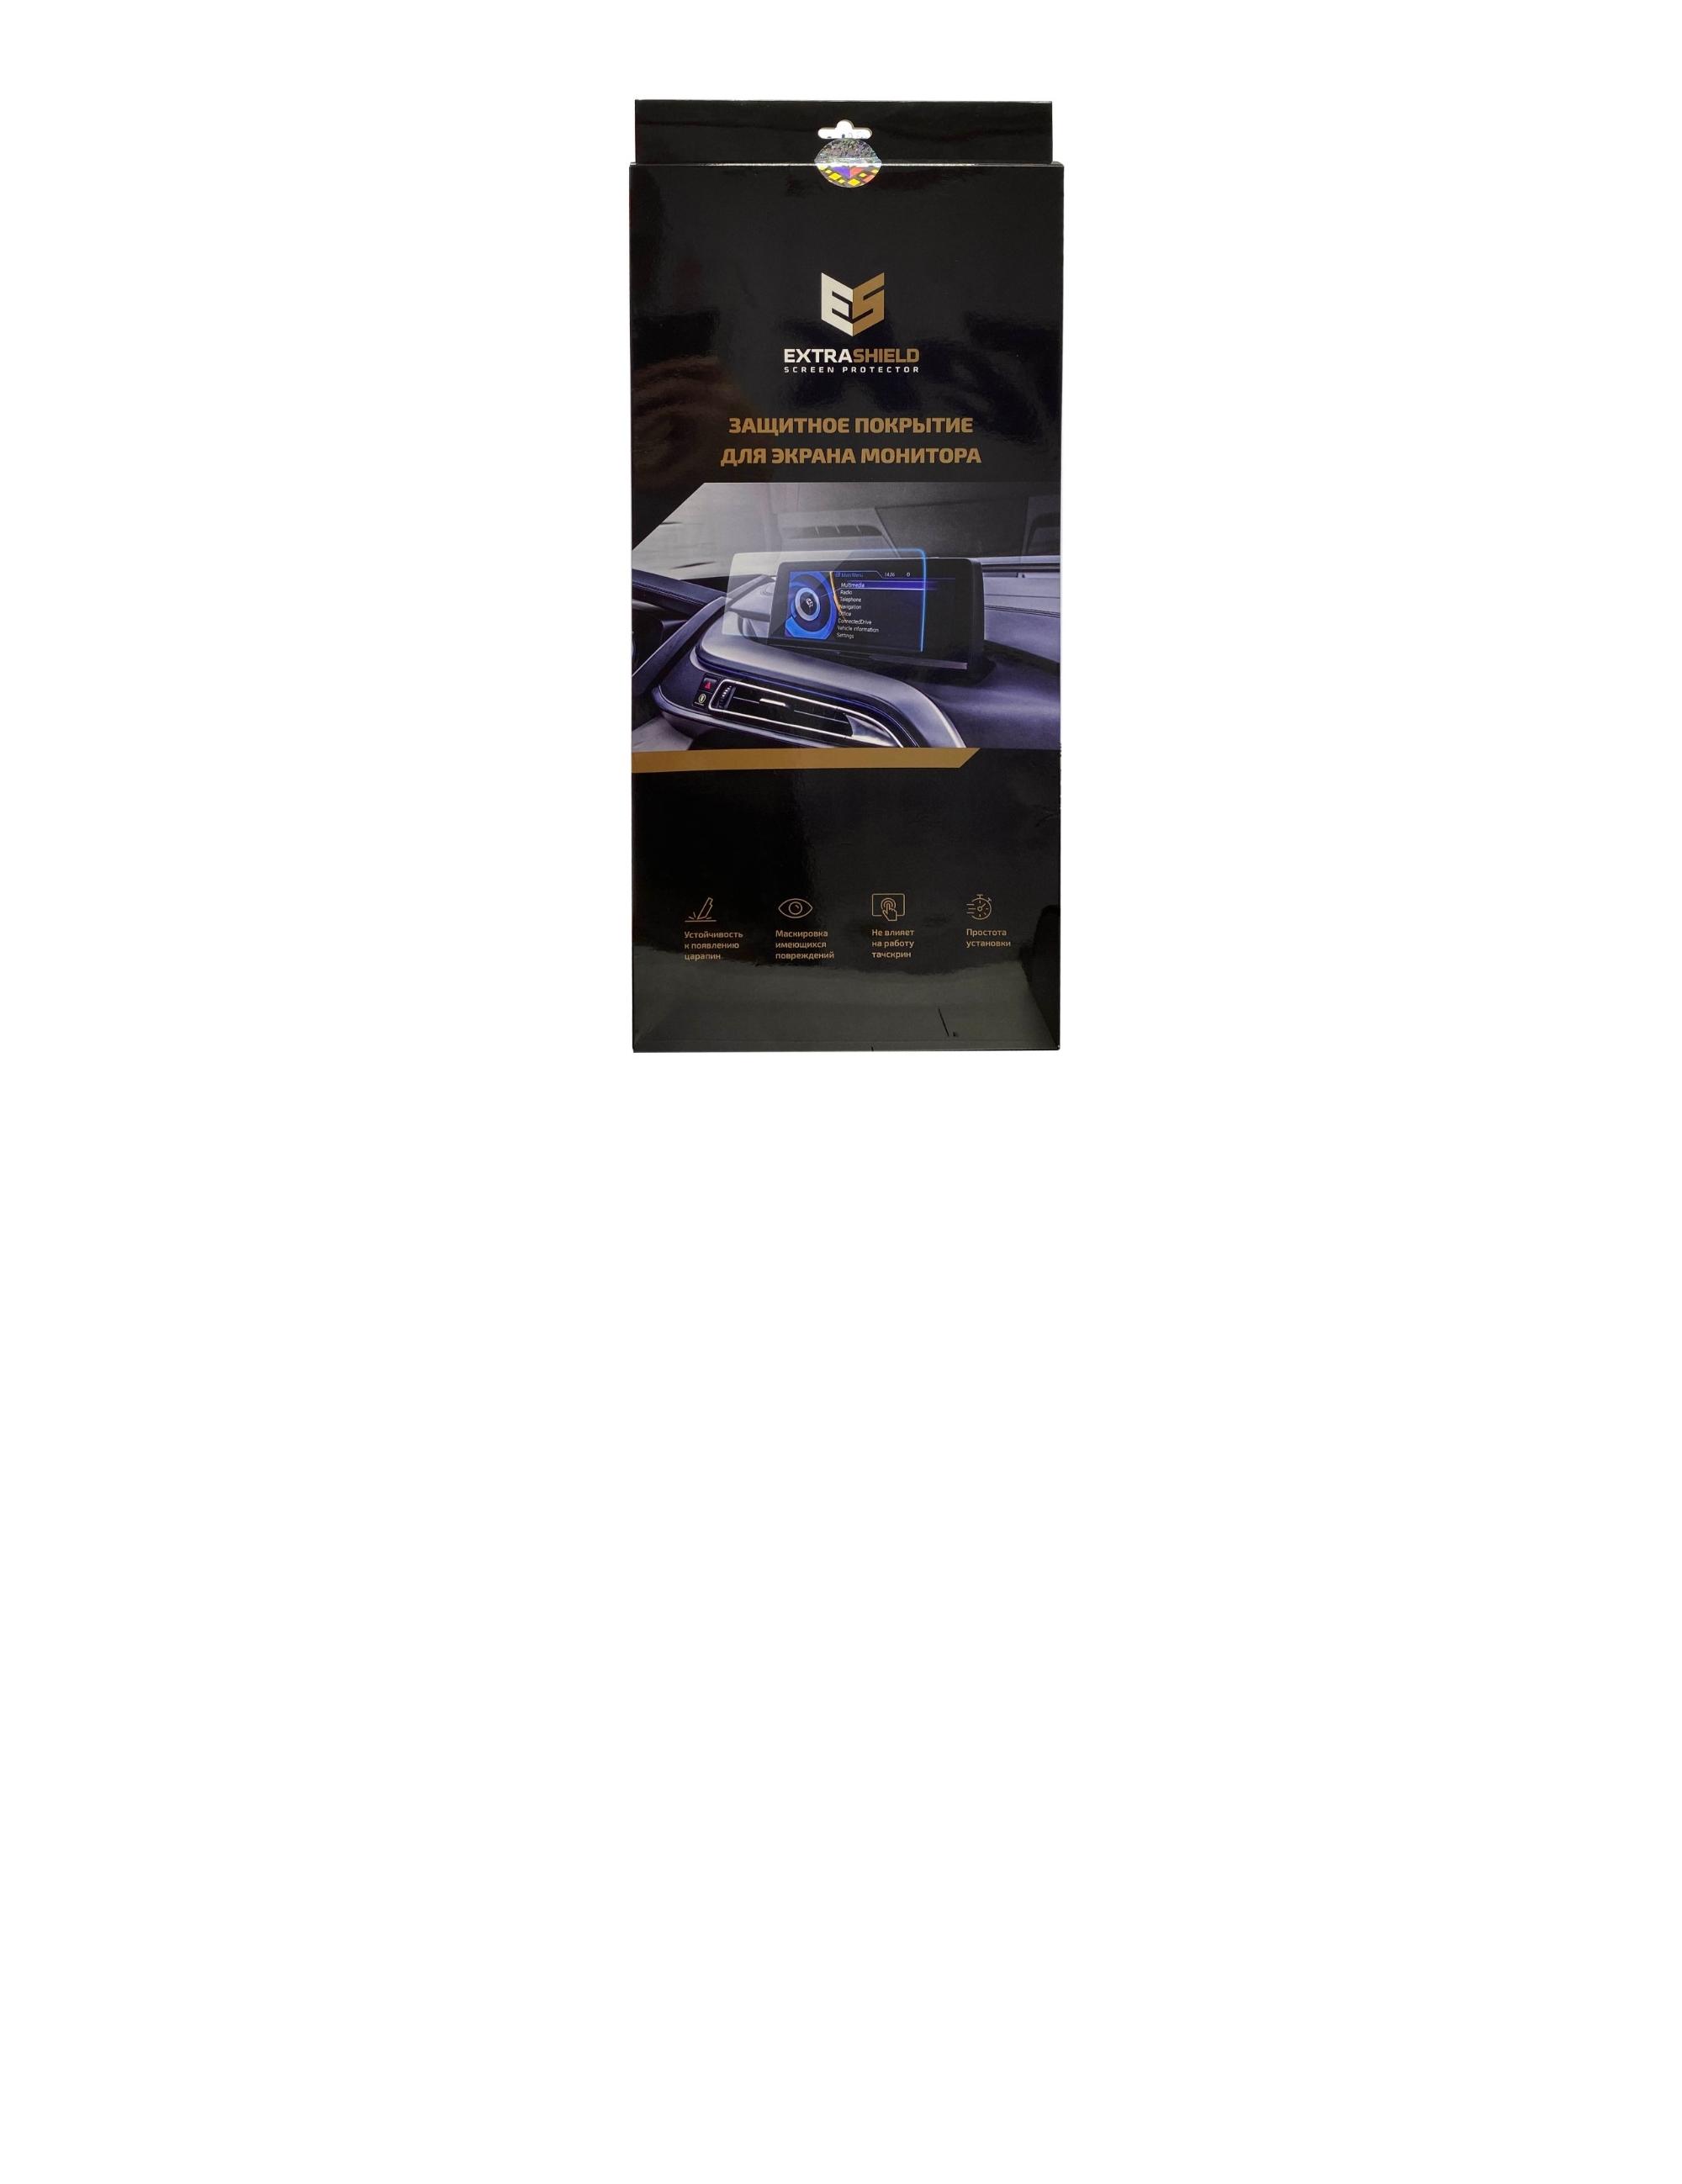 BMW Х5 (F15) 2013 - 2018 мультимедиа 10.2 Защитное стекло Глянец